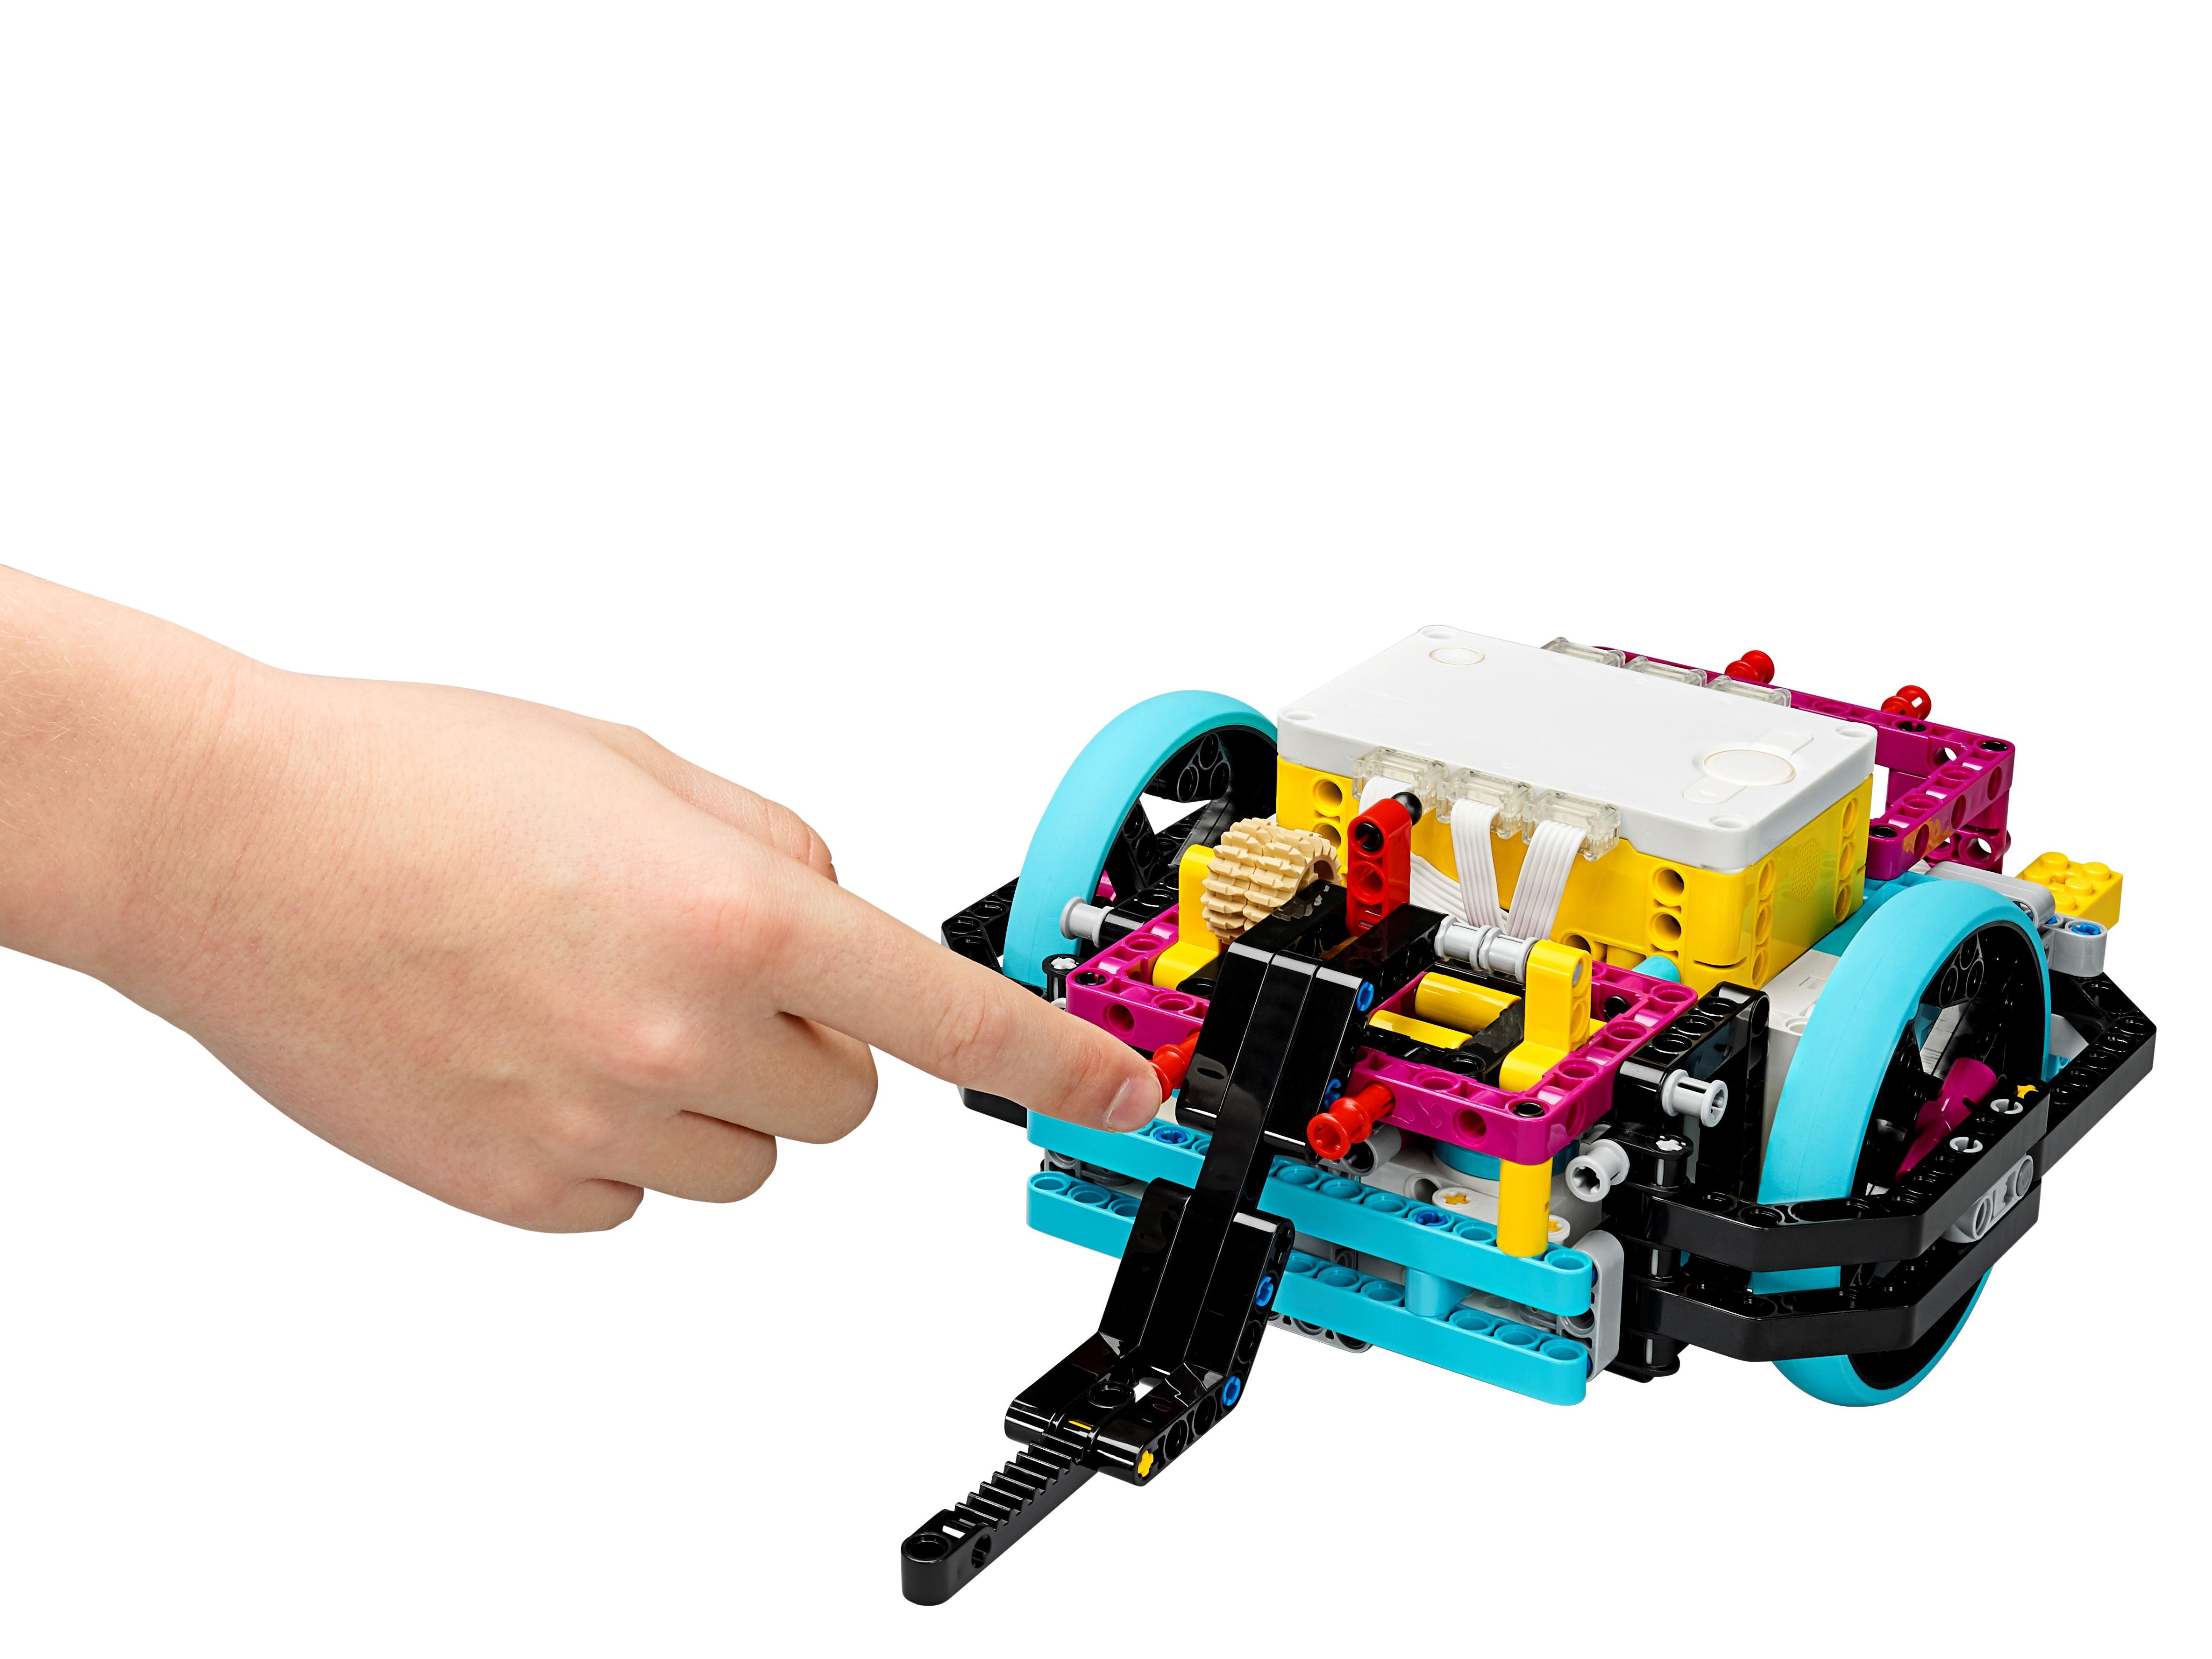 LEGO Technic 45602 Large Angular Motor Robot, 45678 New - Spike Prime